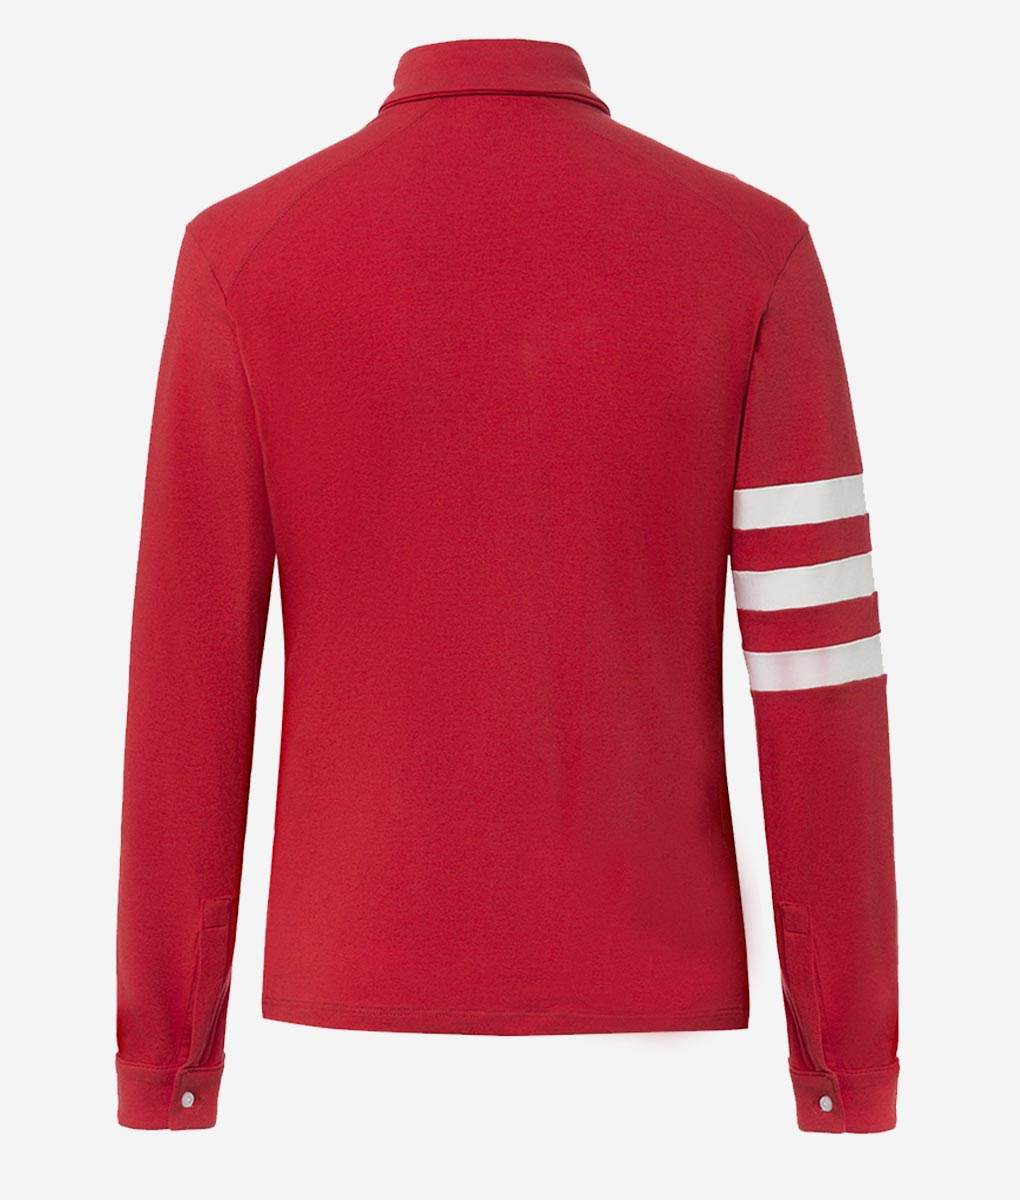 casual-cycling-transparent-red-merino-shirt-back